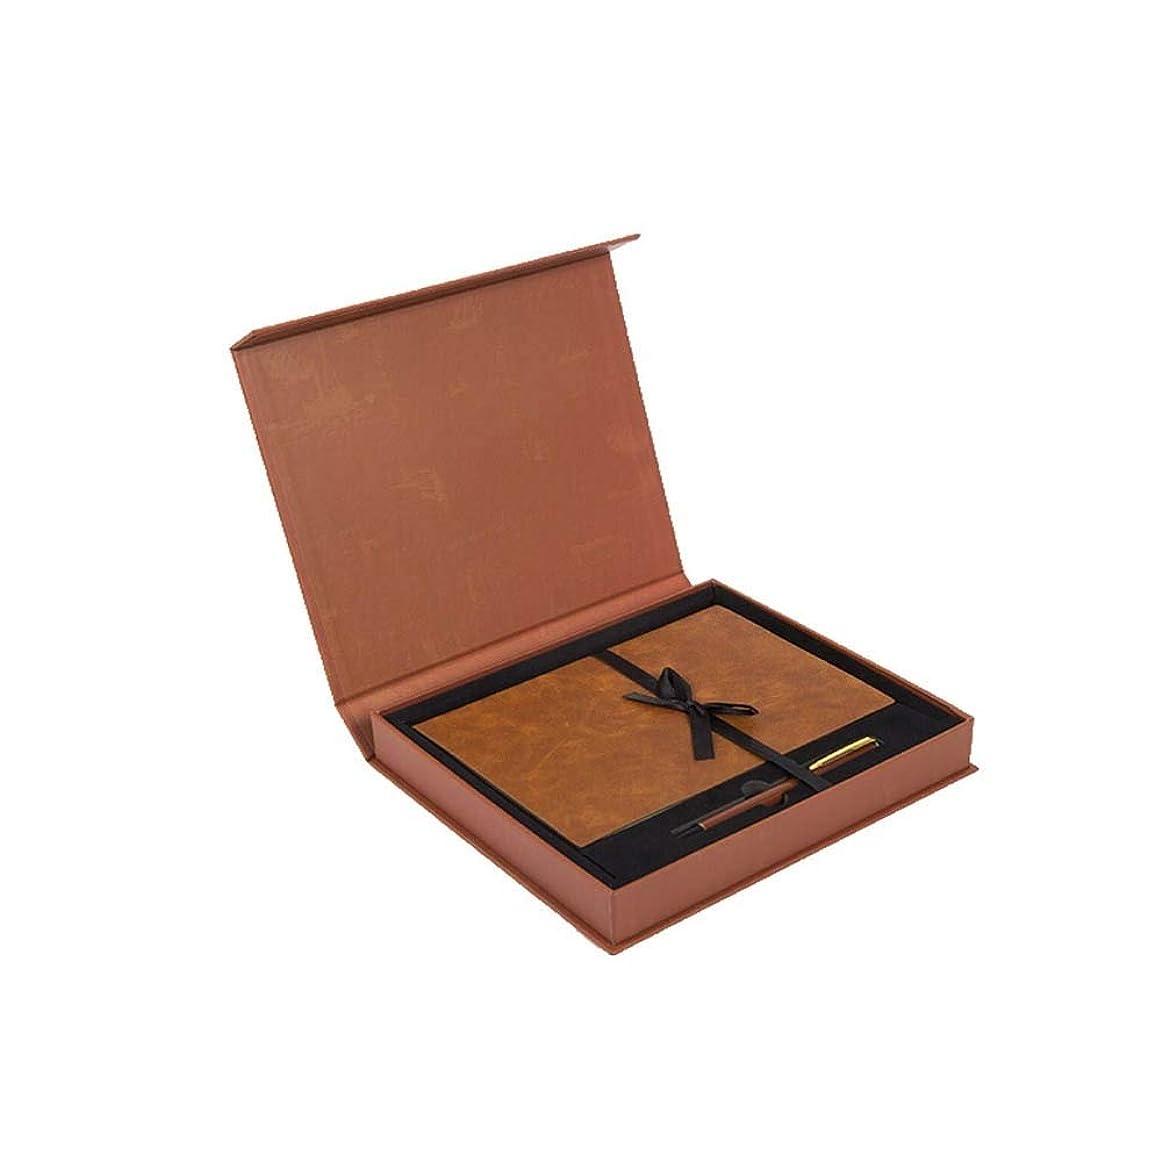 Jielongtongxun ノートブック - ギフトボックスセット、A5厚手メモ帳、革日記クリエイティブノート、文房具誕生日プレゼント、ギフトボックスセット、高品質 繊細でシンプル (Color : Brown)